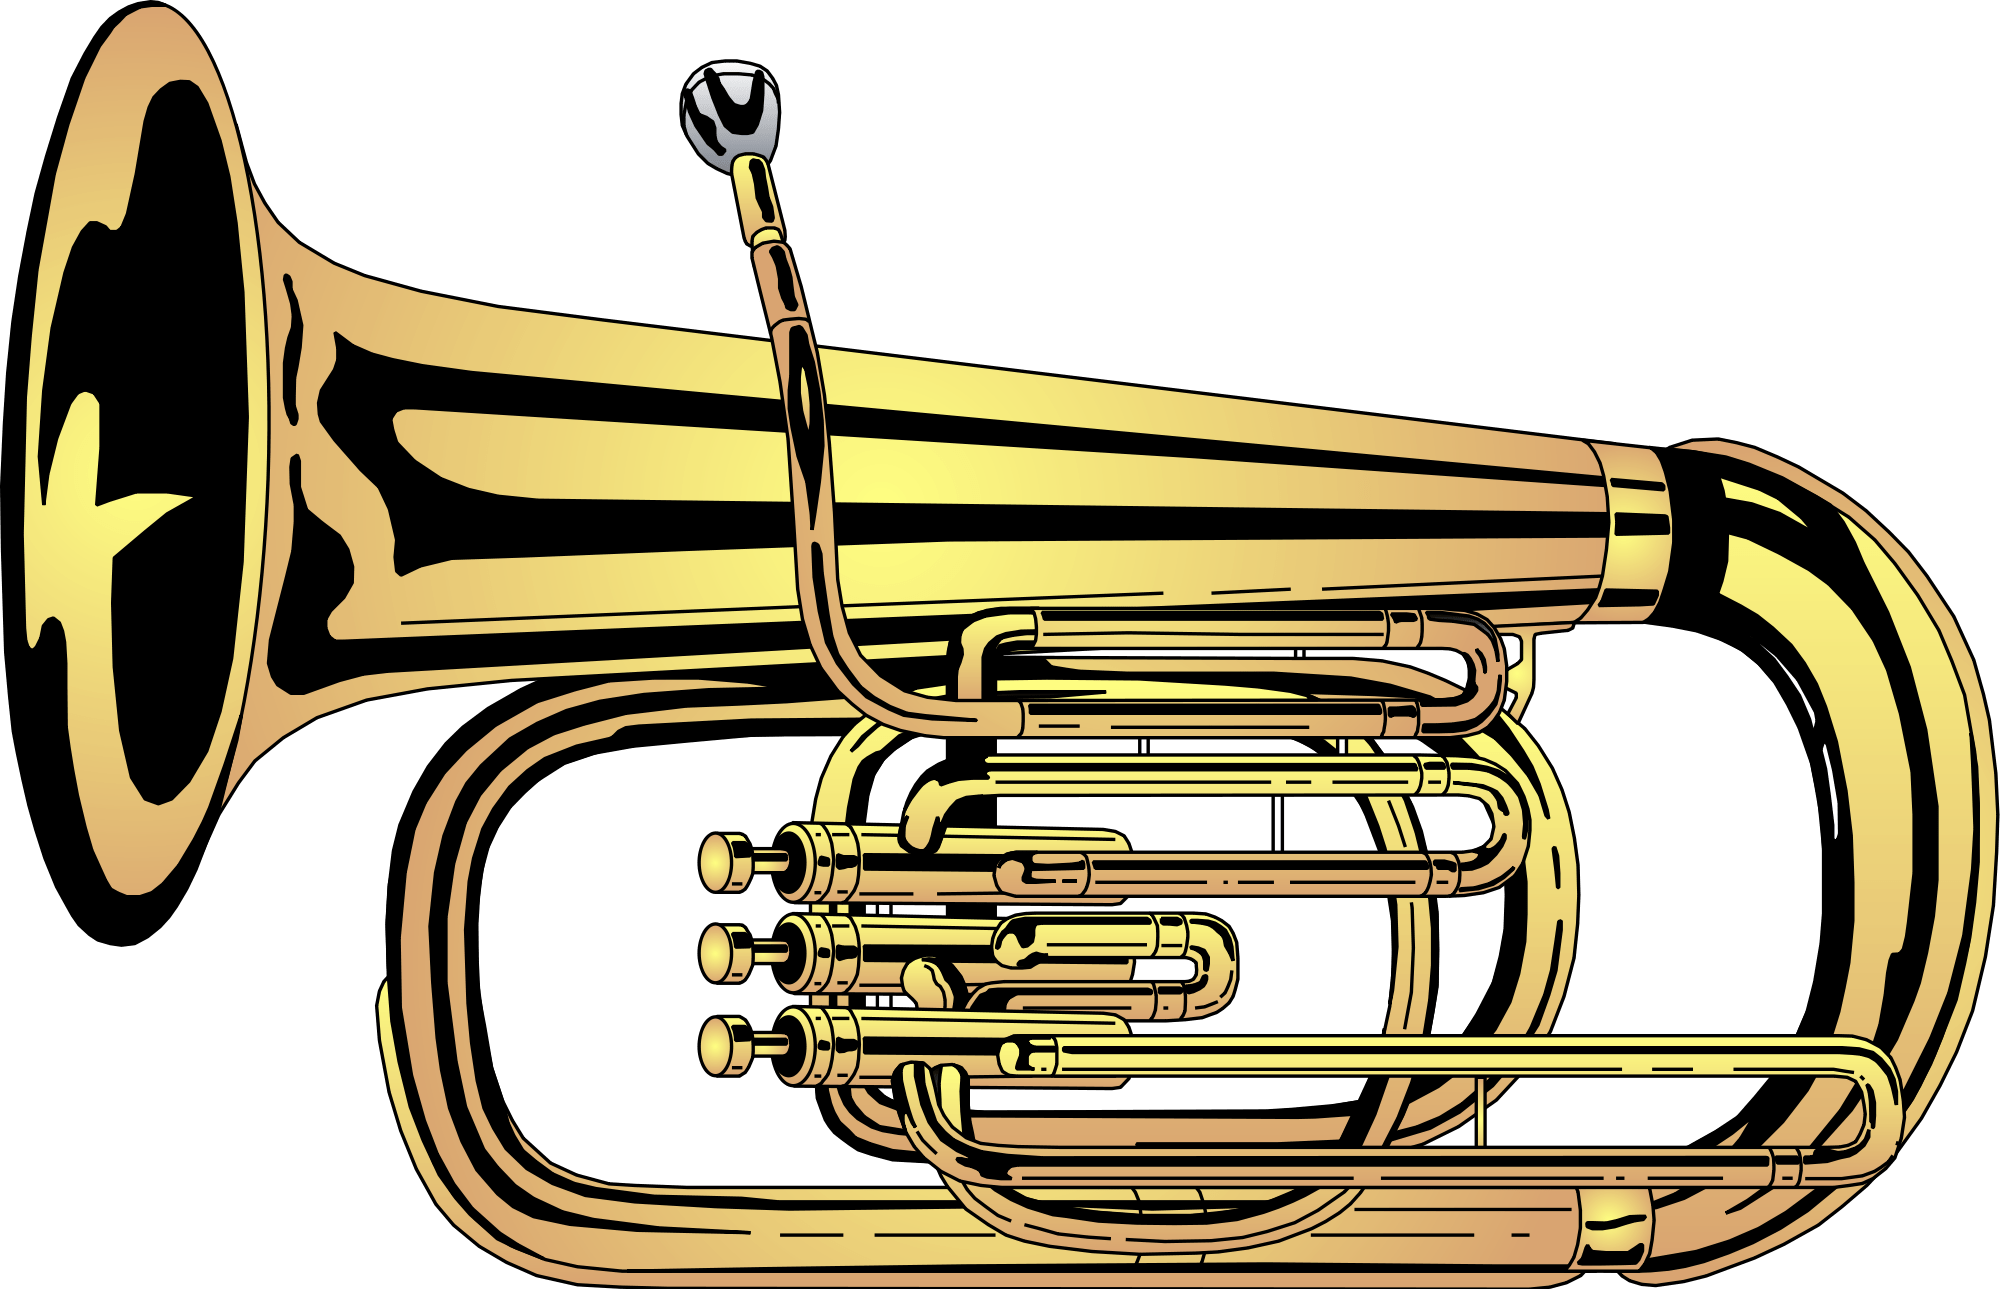 tuba clipart transparent png stickpng rh stickpng com playing tuba clipart playing tuba clipart